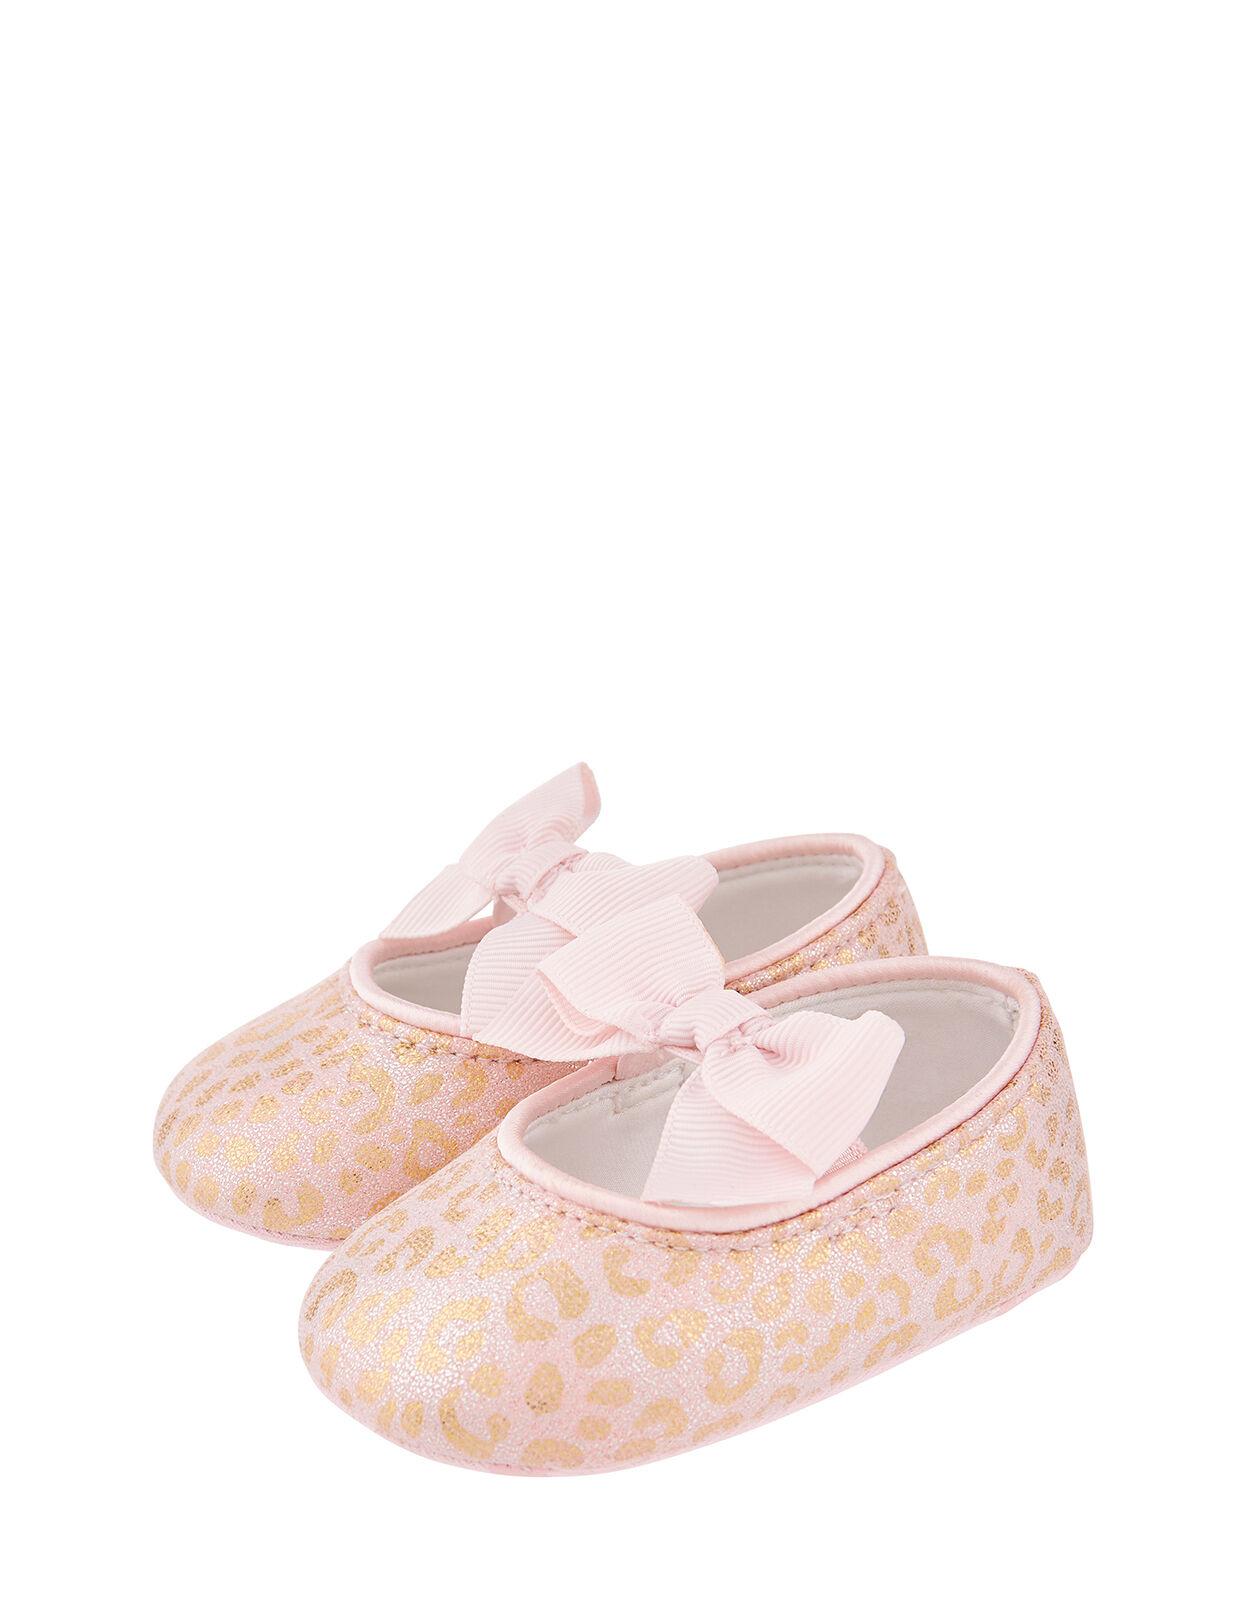 Baby Shoes | Children's | Monsoon UK